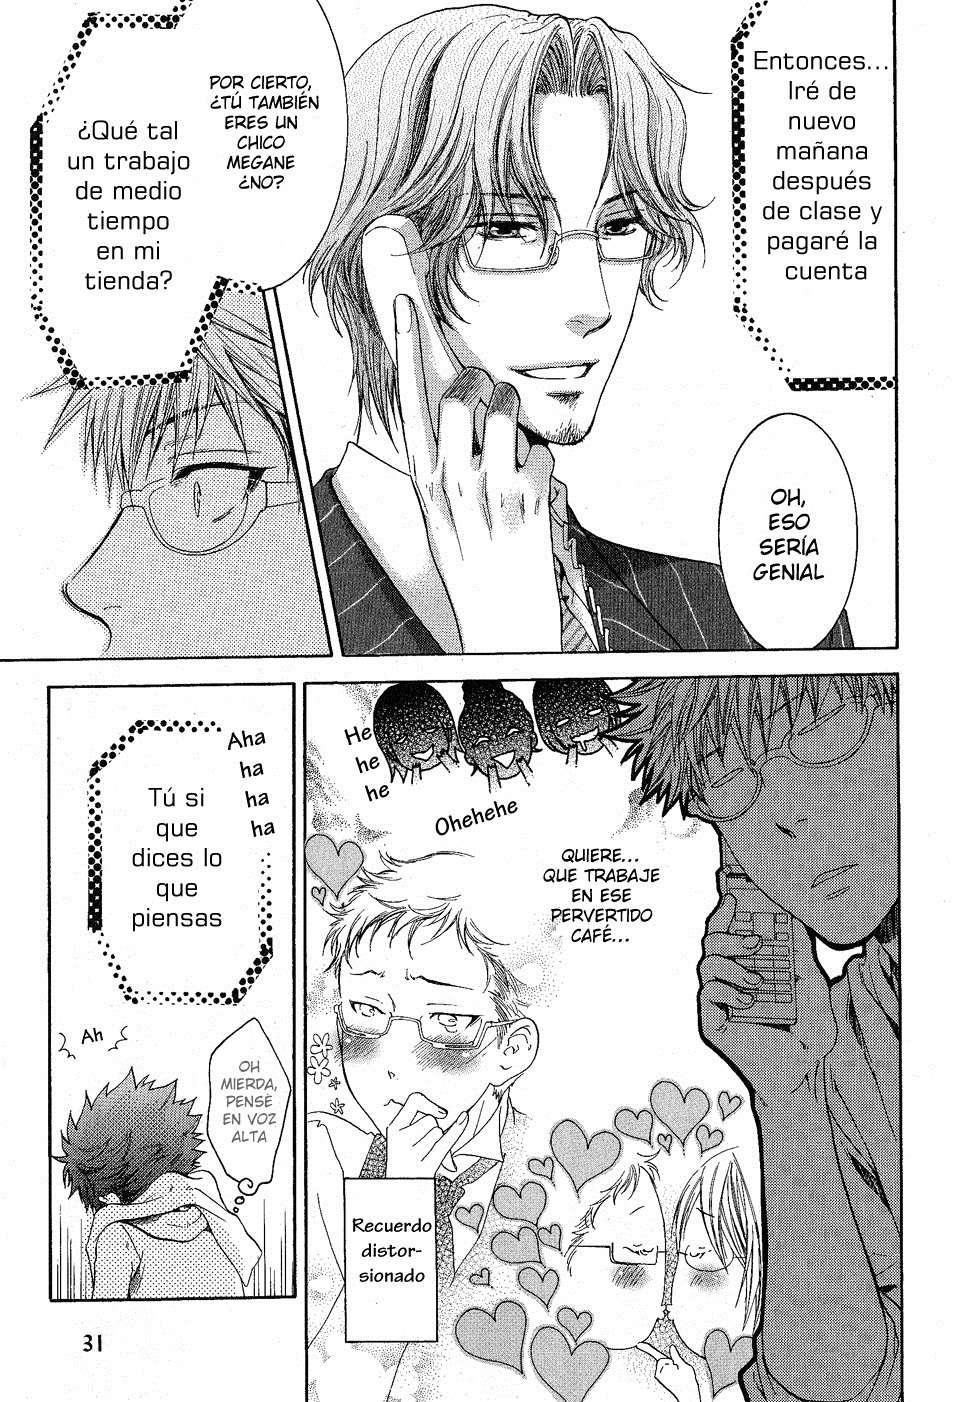 https://c5.ninemanga.com/es_manga/6/15814/378262/a818ba265a8668f79e1df45a0ee24961.jpg Page 28